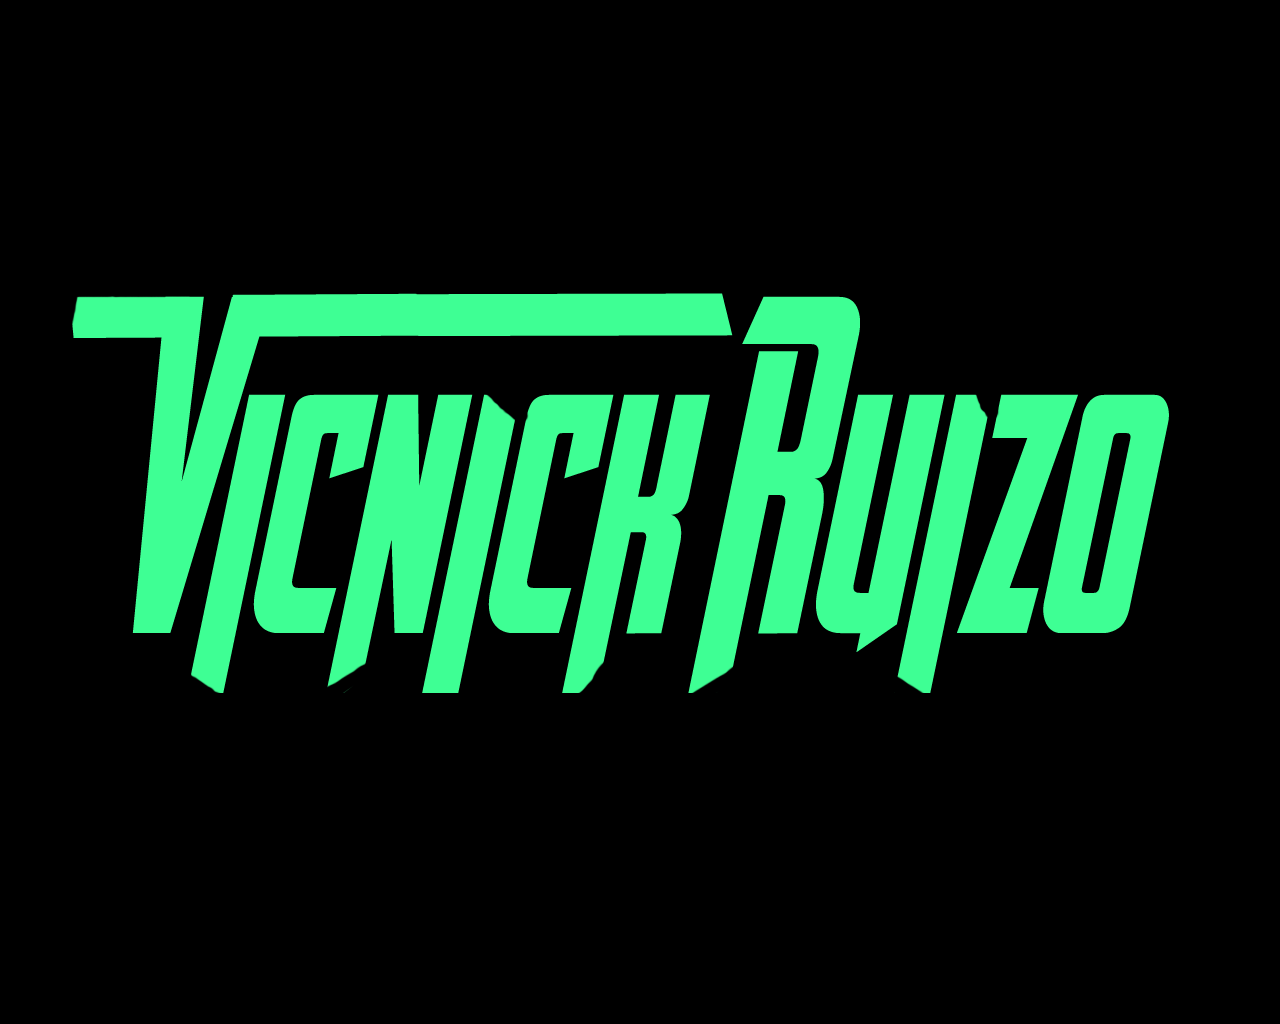 VNR   Vic Nick Ruizo